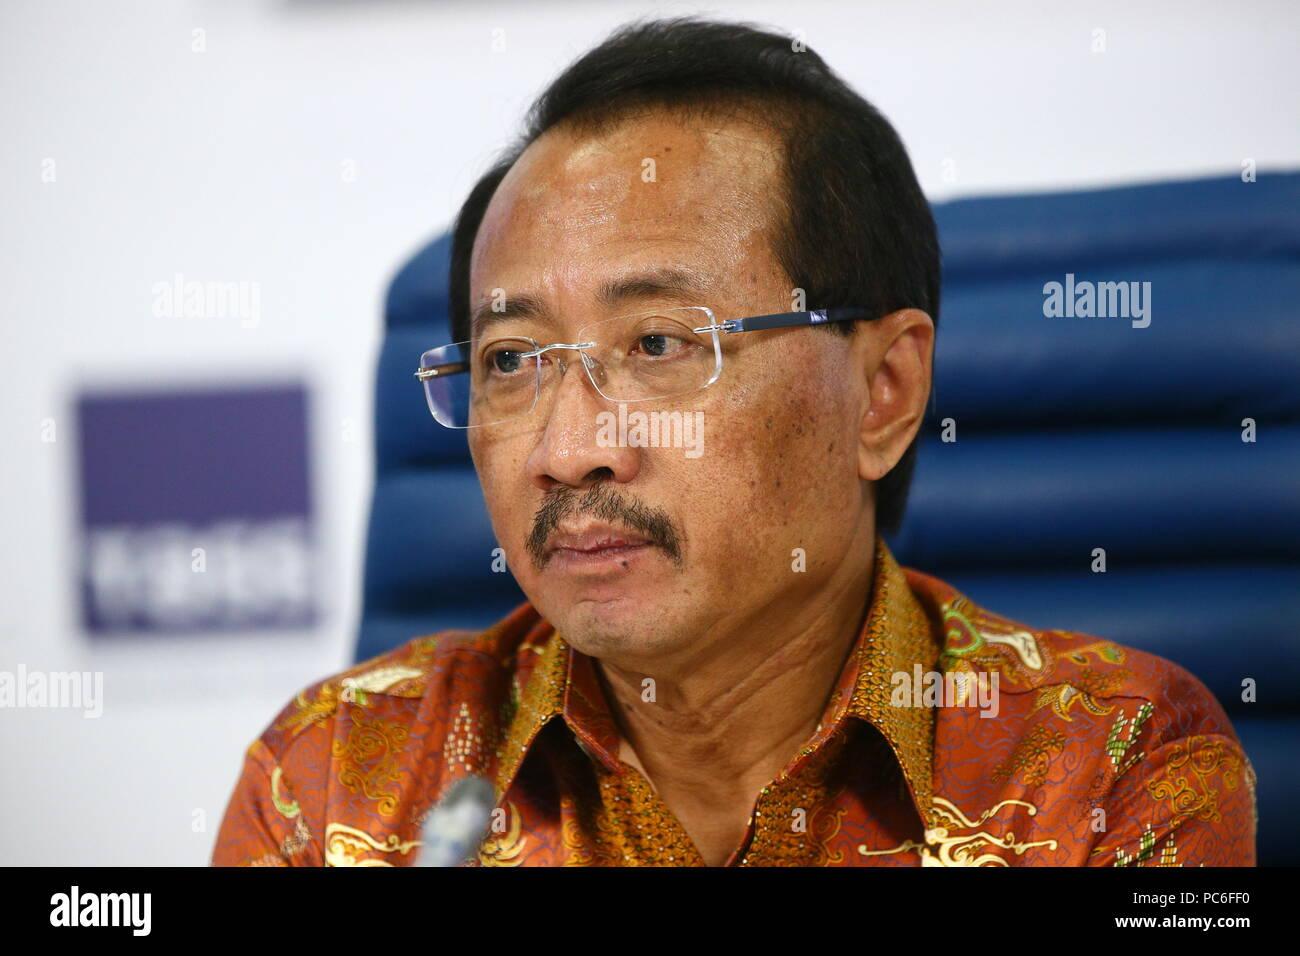 Dating Agence Indonésie sous-titre